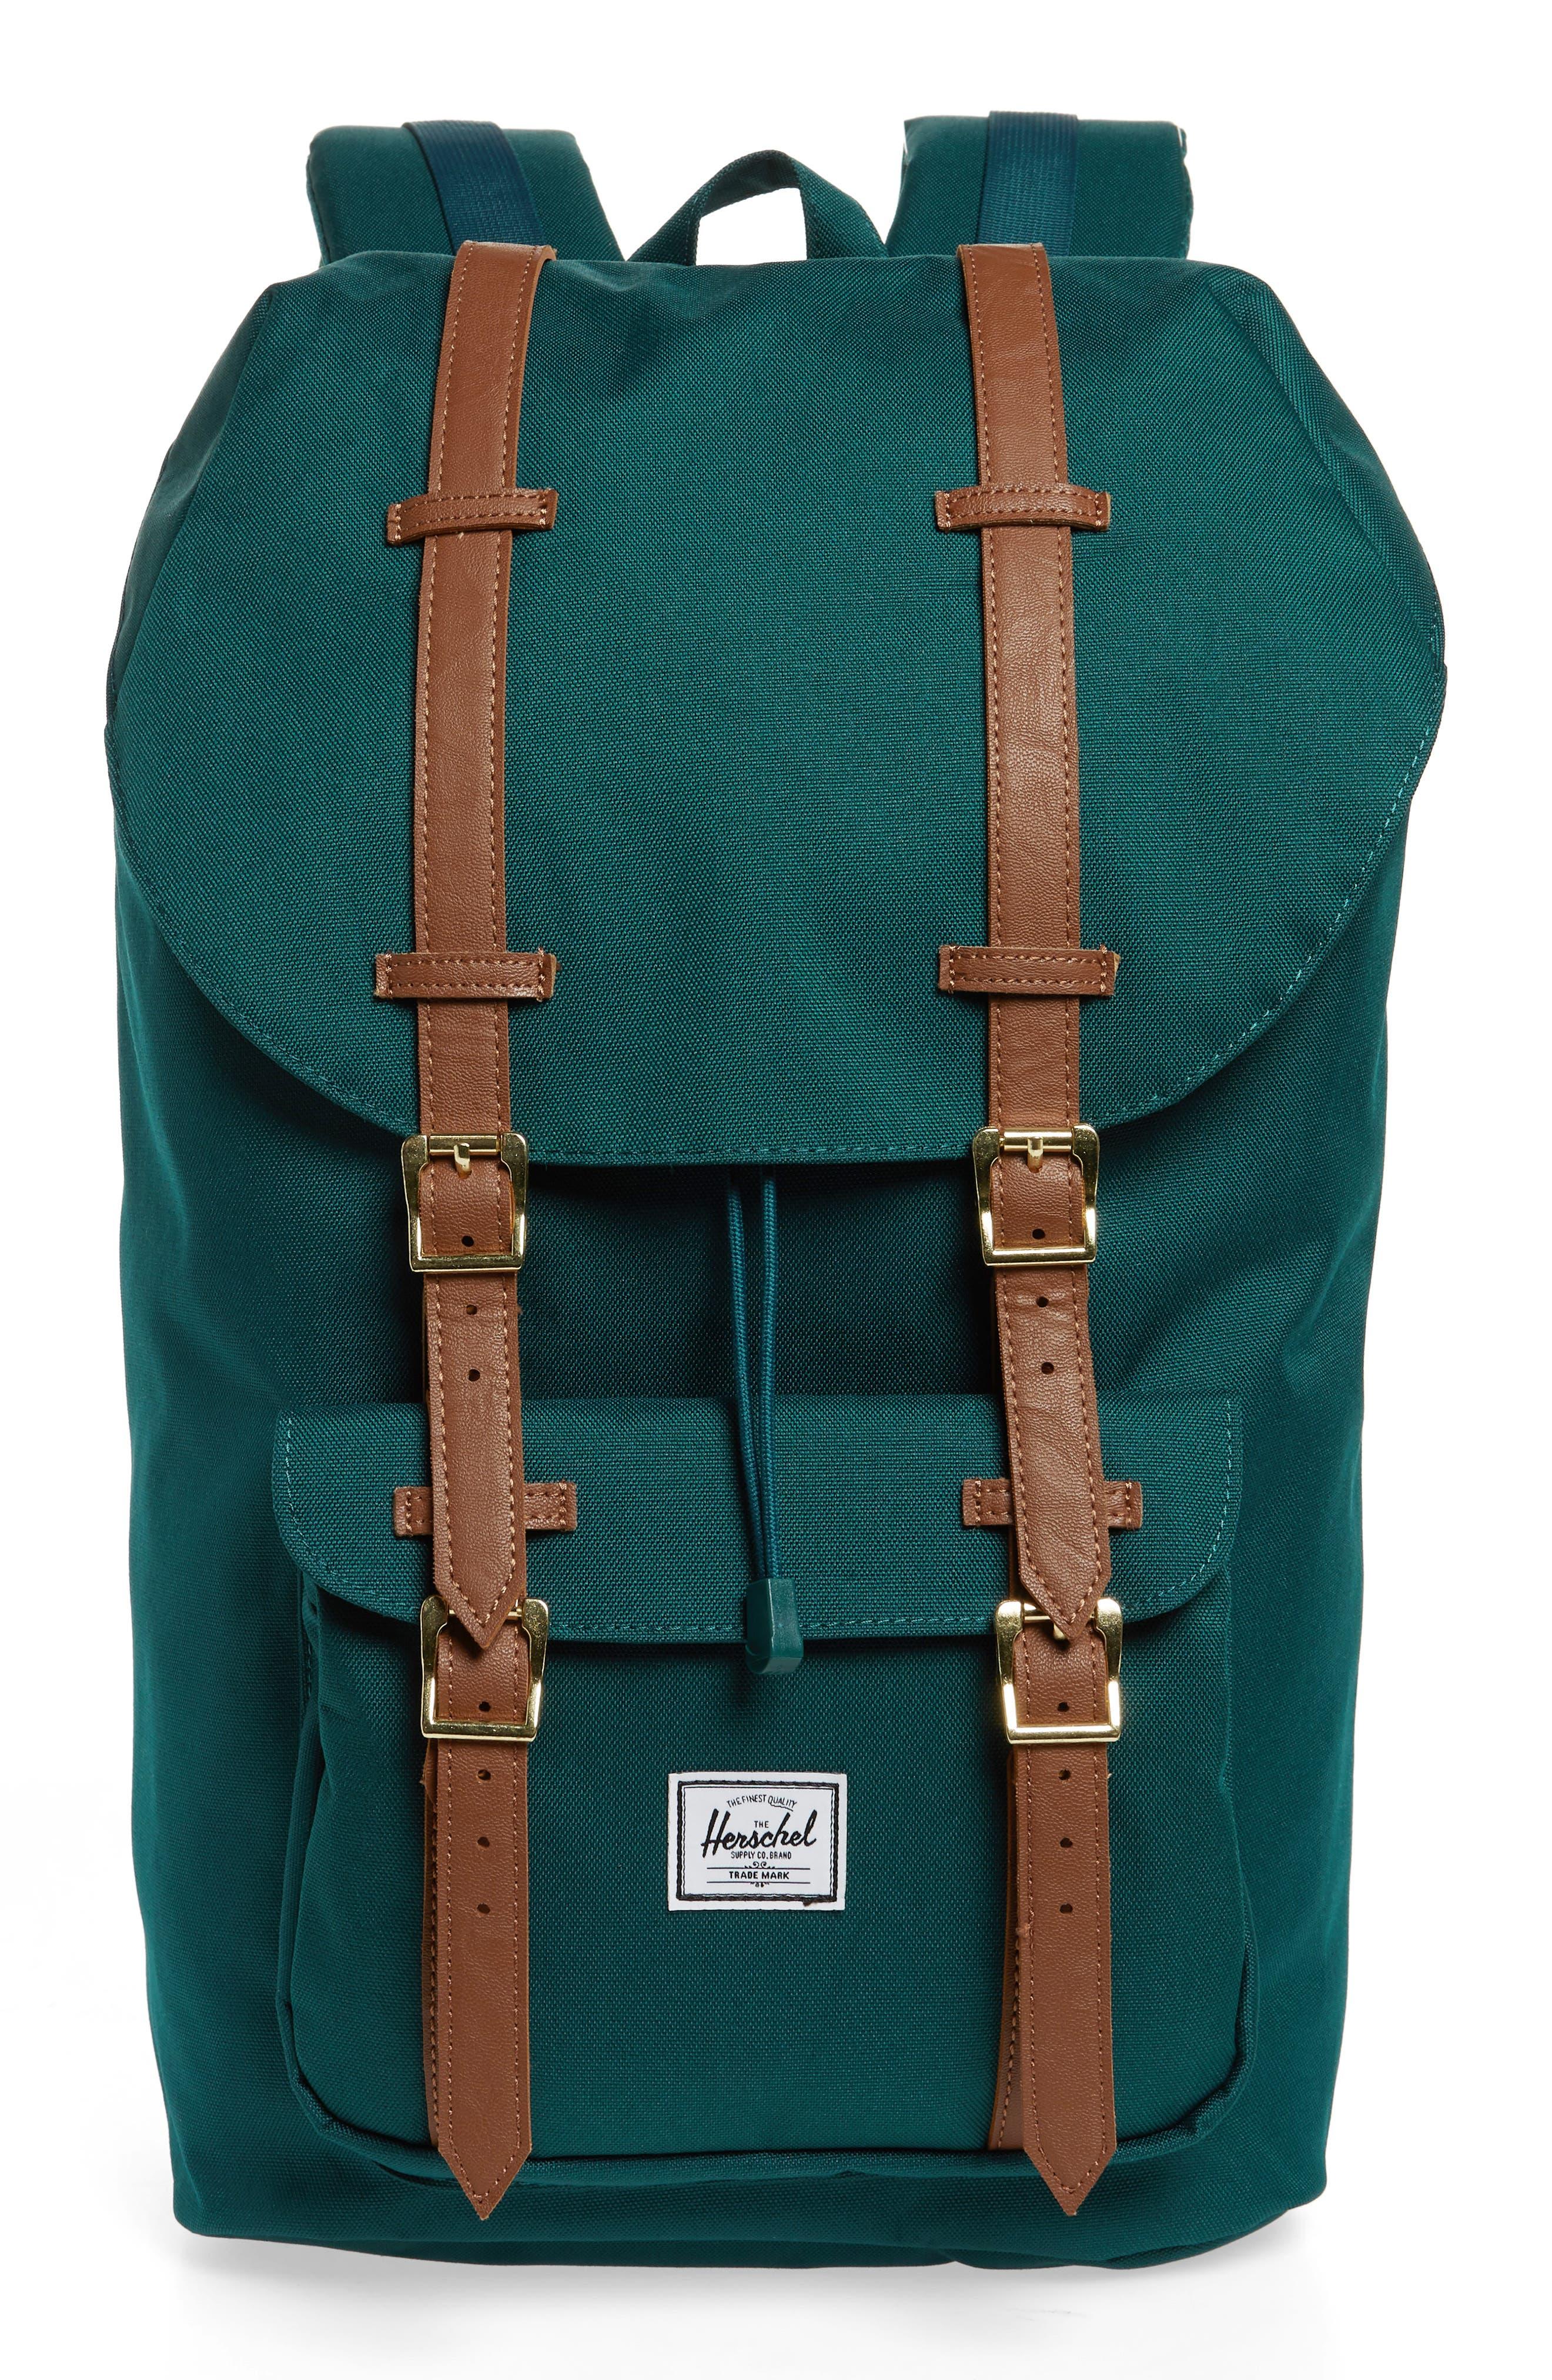 Little America Backpack,                             Main thumbnail 1, color,                             DEEP TEAL/ TAN